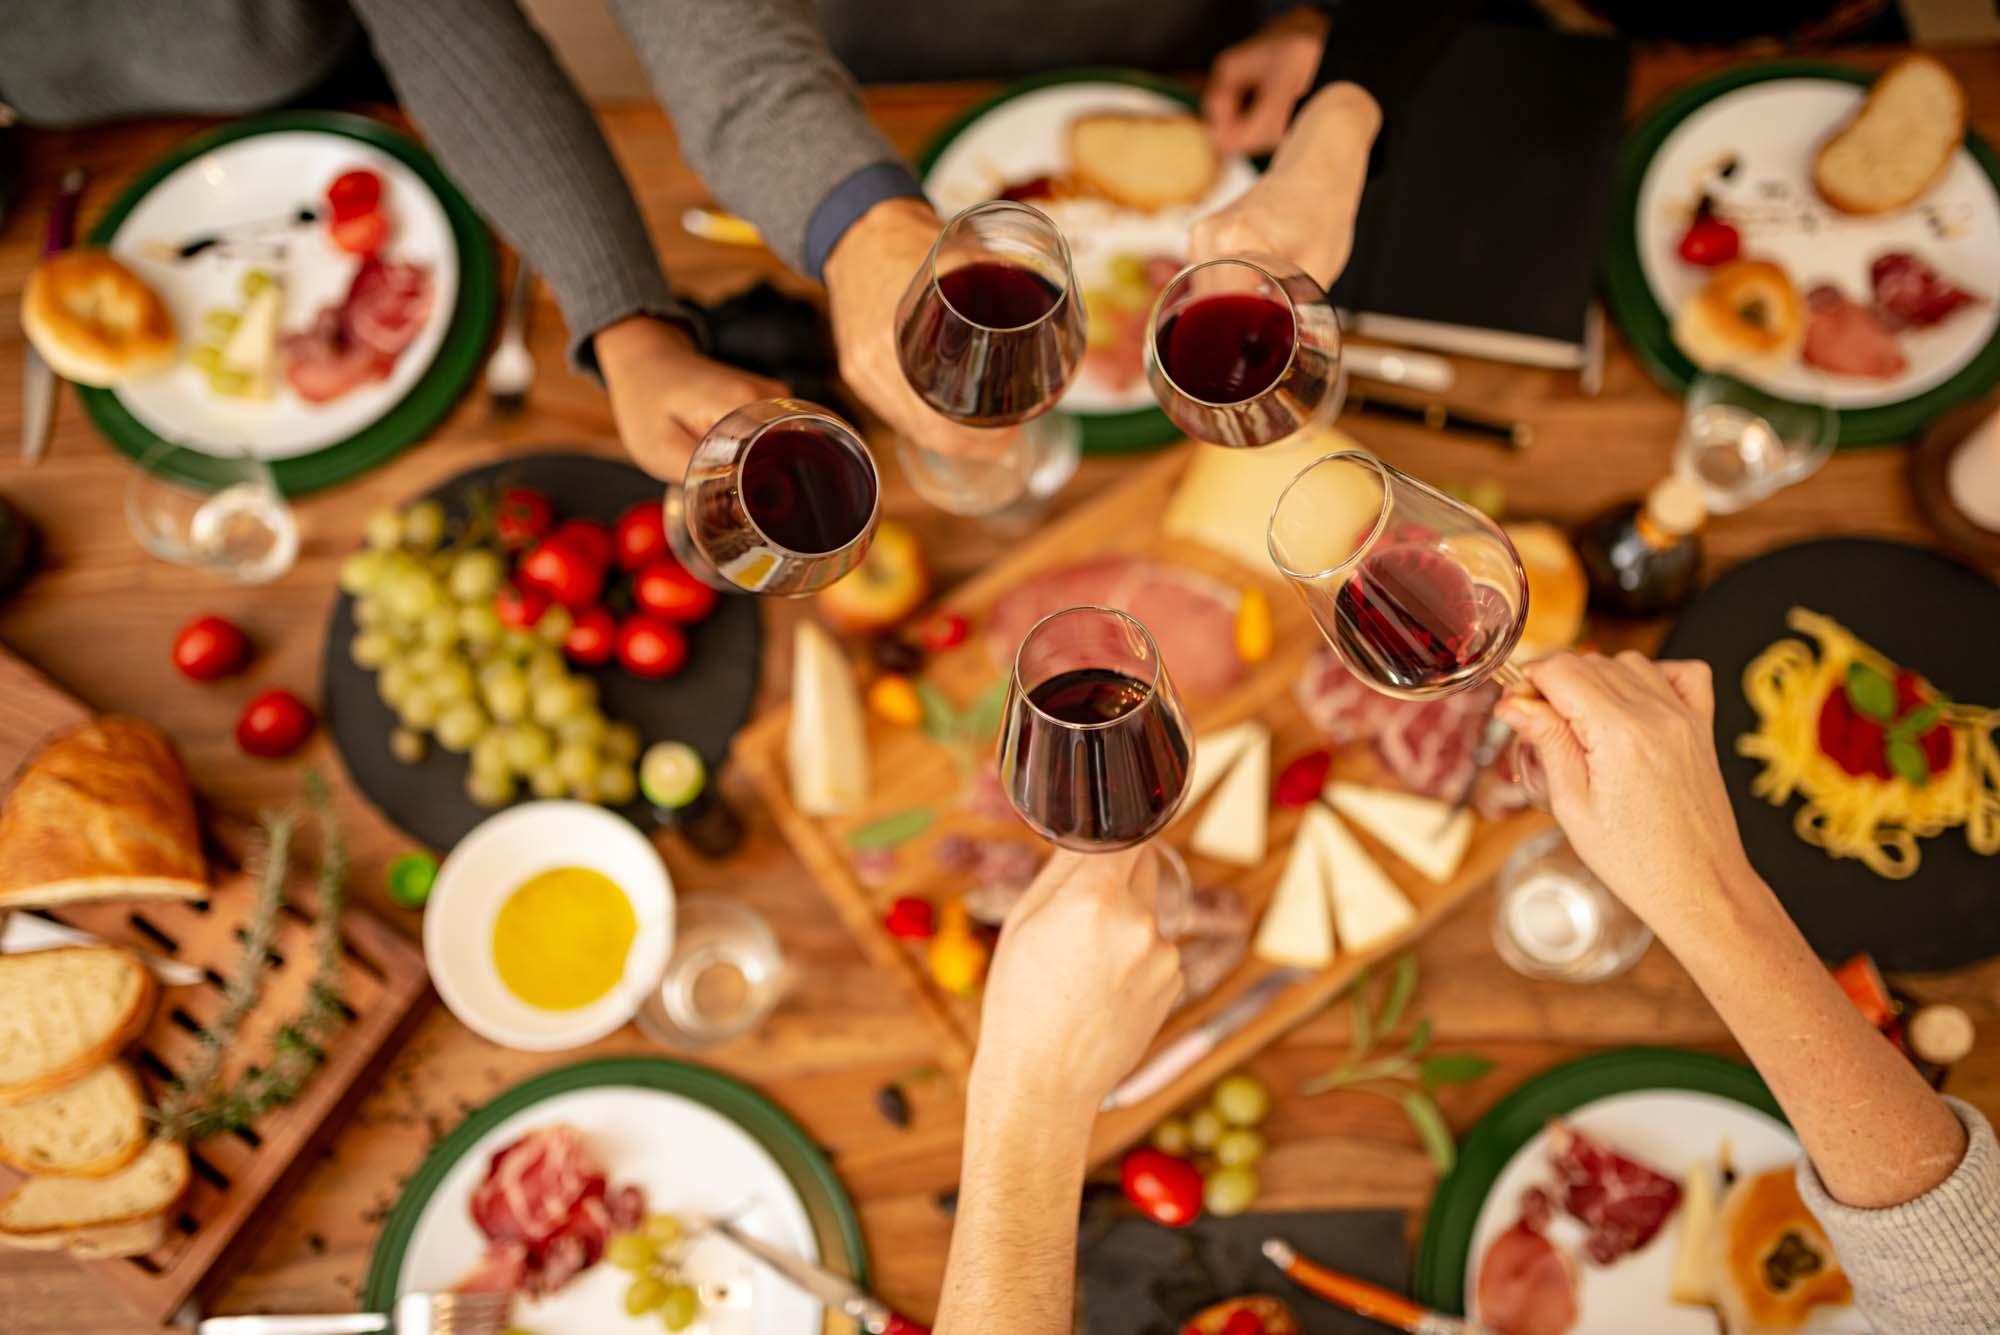 Corsi Di Cucina Cene Aziendali a Padova